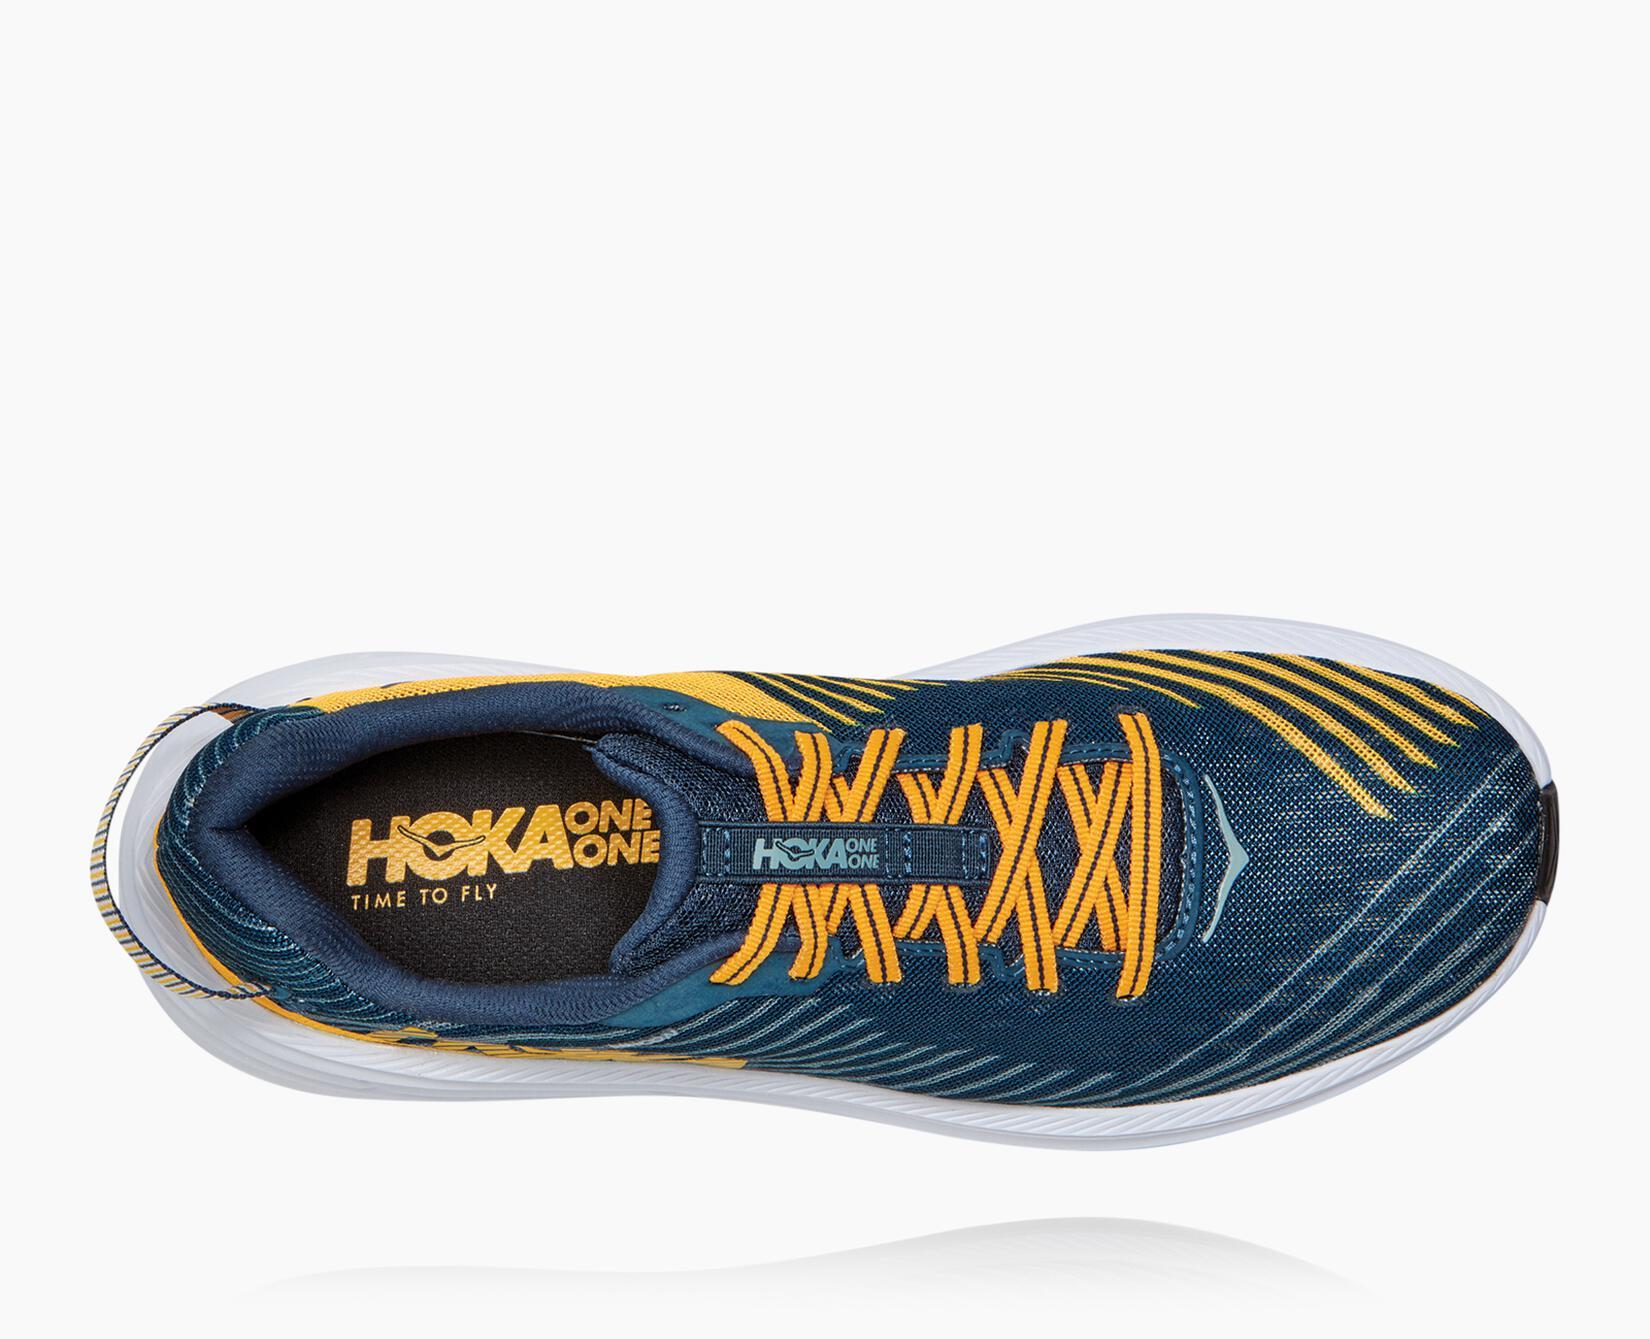 Hoka Rincon - Men's